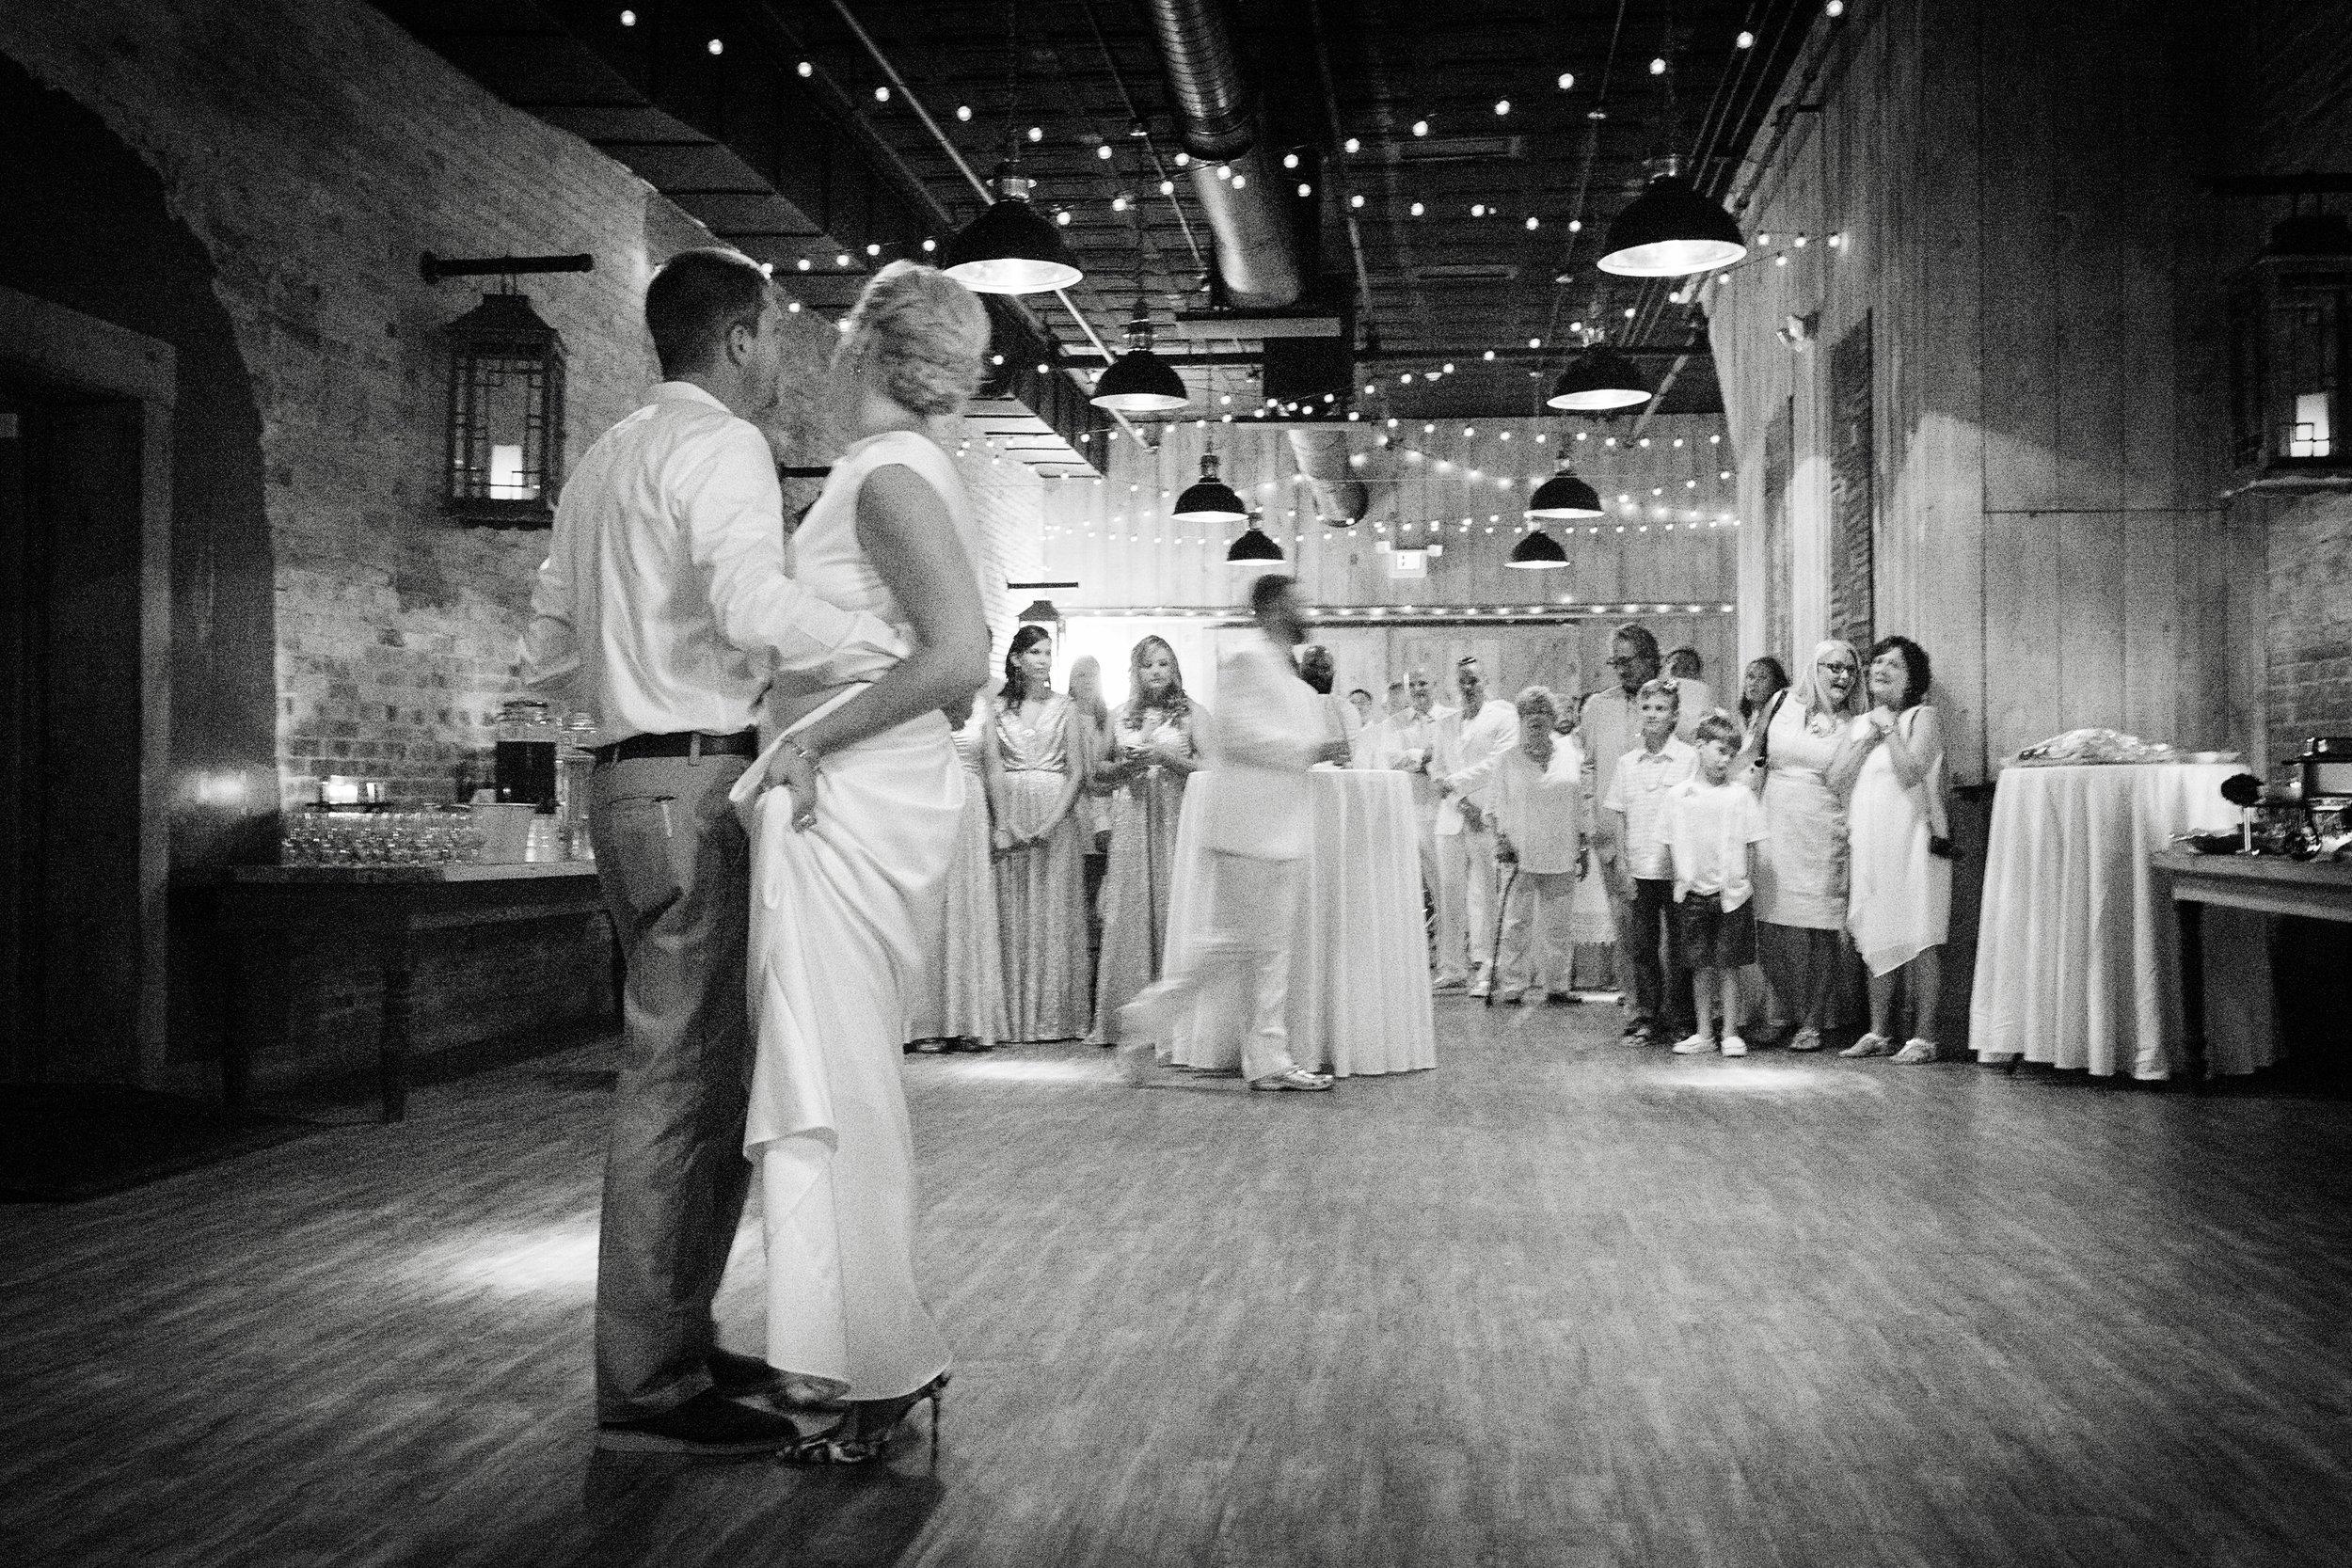 20160723_Epps-Wedding-Party_022.jpg